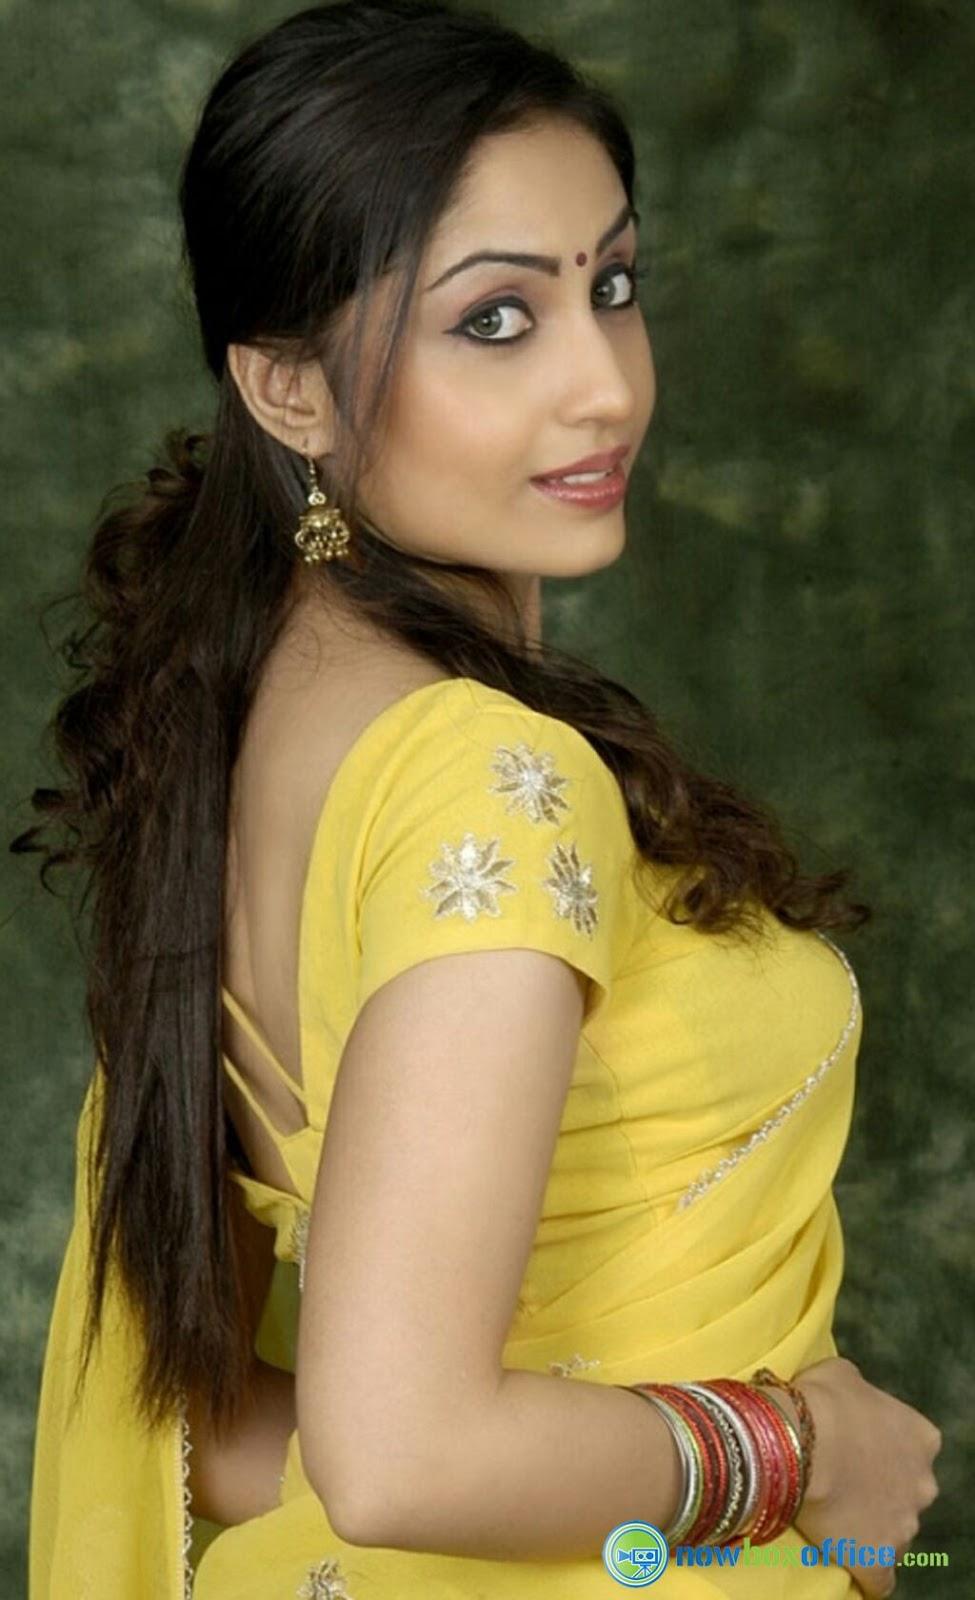 aishwarya nag twitter